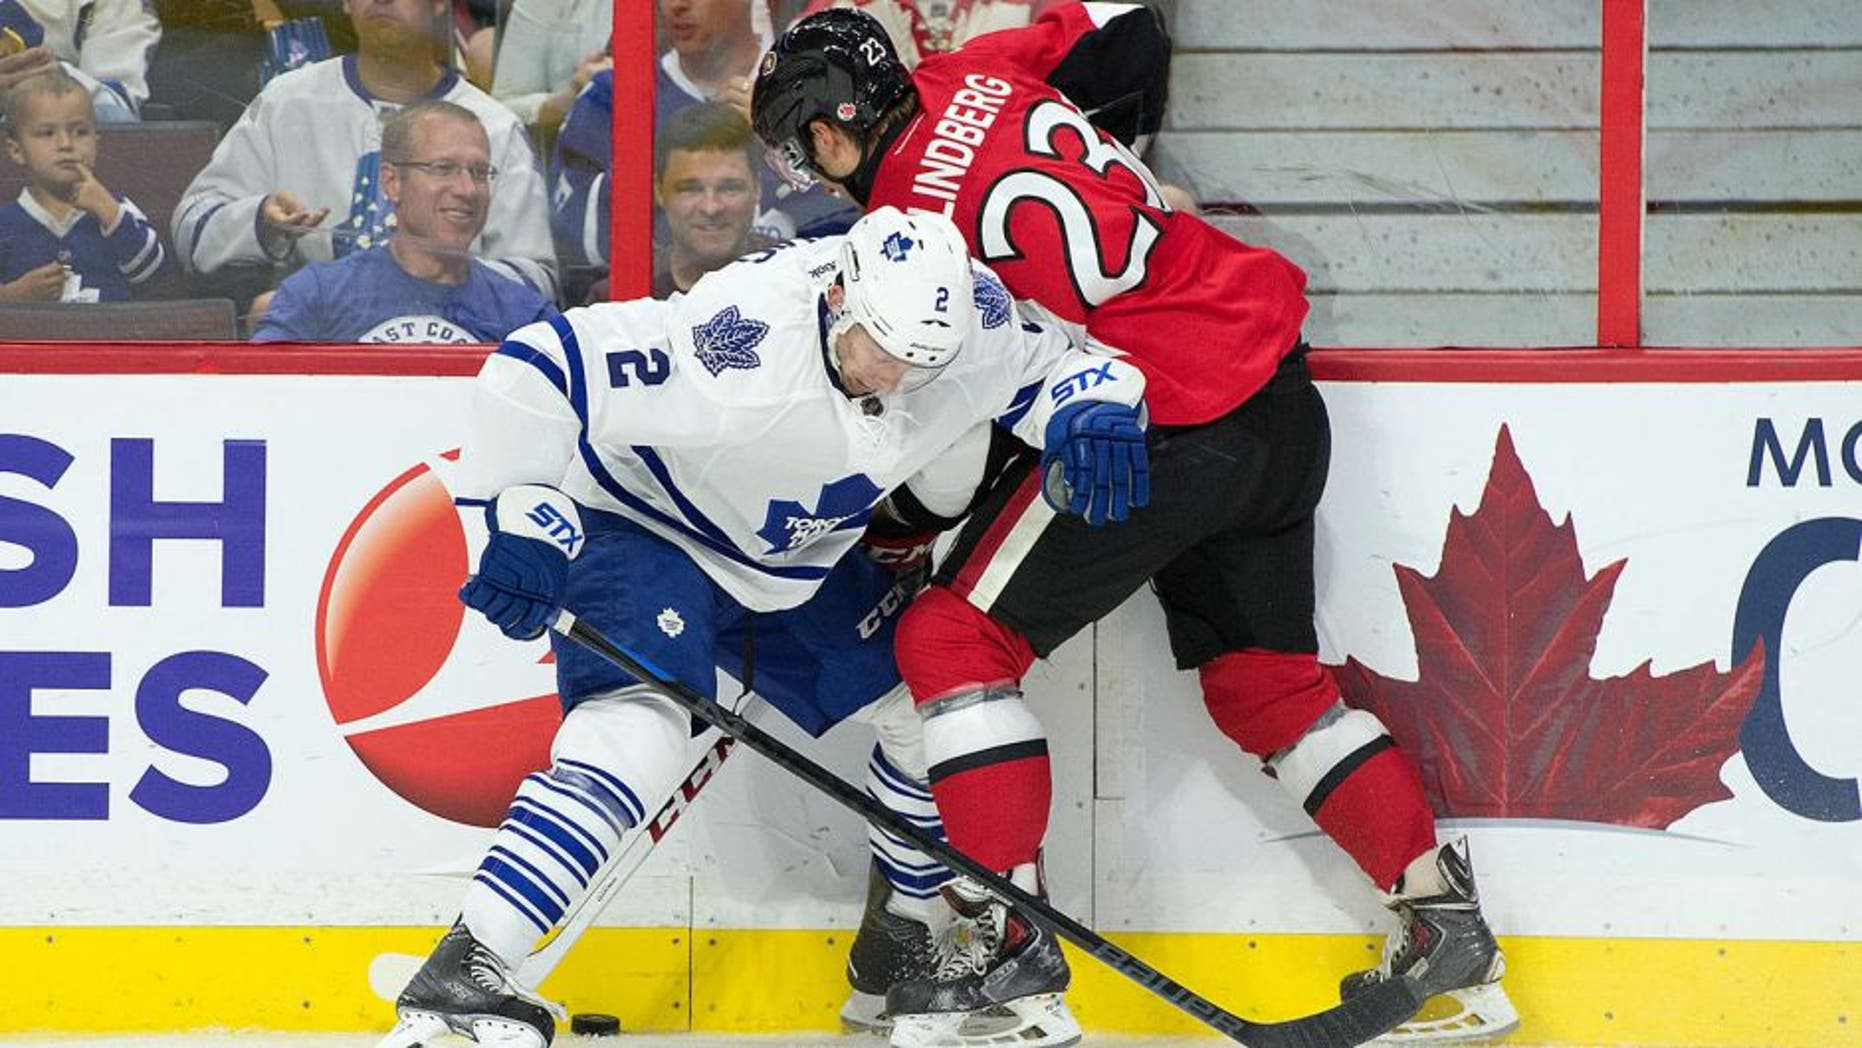 Sep 21, 2015; Ottawa, Ontario, CAN; Toronto Maple Leafs defenseman Matt Hunwick (2) and Ottawa Senators ight wing Tobias Lindberg (23) battle for the puck in the second period at Canadian Tire Centre. Mandatory Credit: Marc DesRosiers-USA TODAY Sports